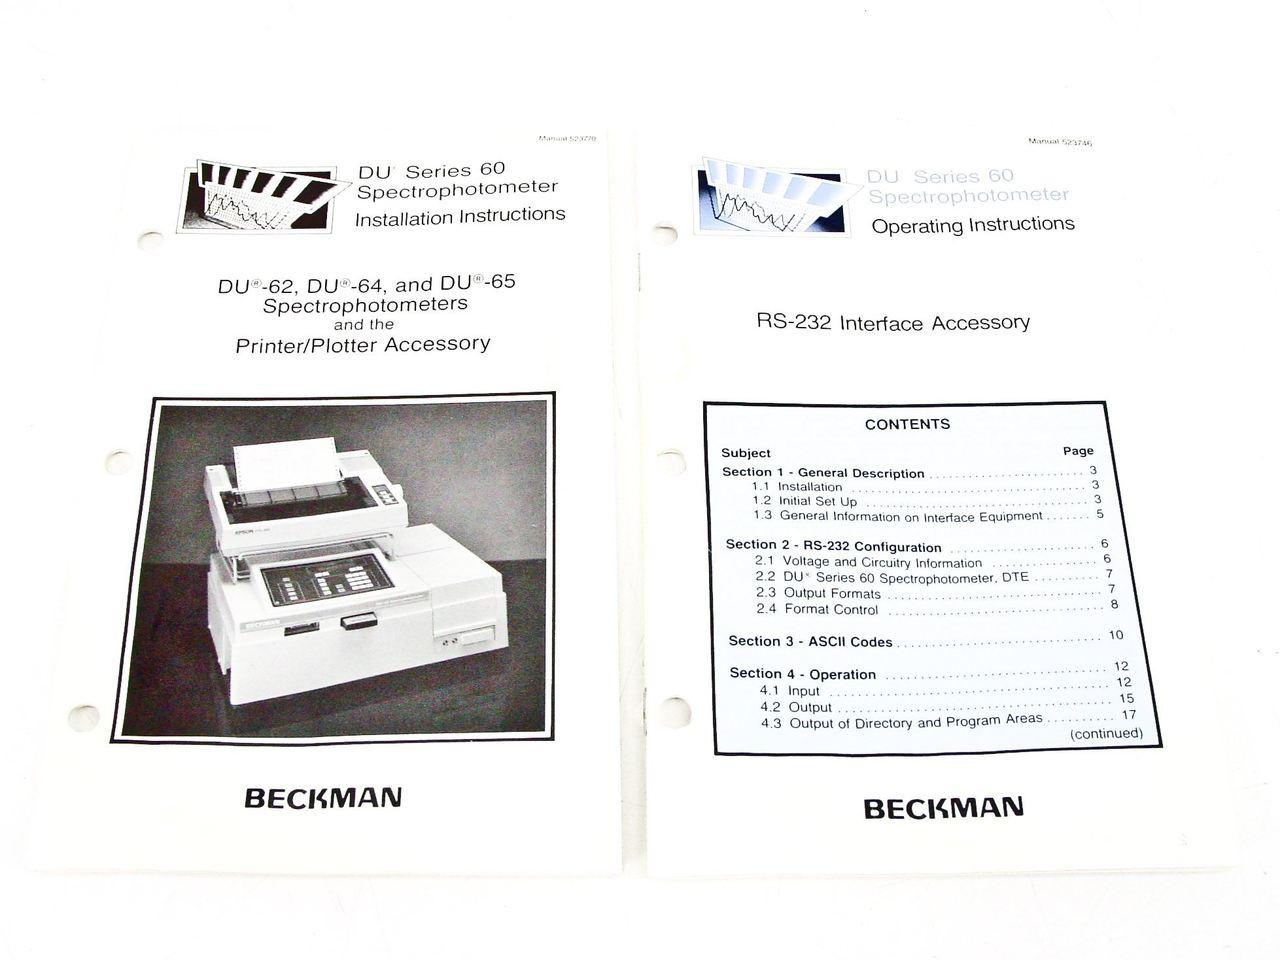 Beckman DU-65 UV-Visible Scanning Spectrophotometer -Doesn't Pass Self Test